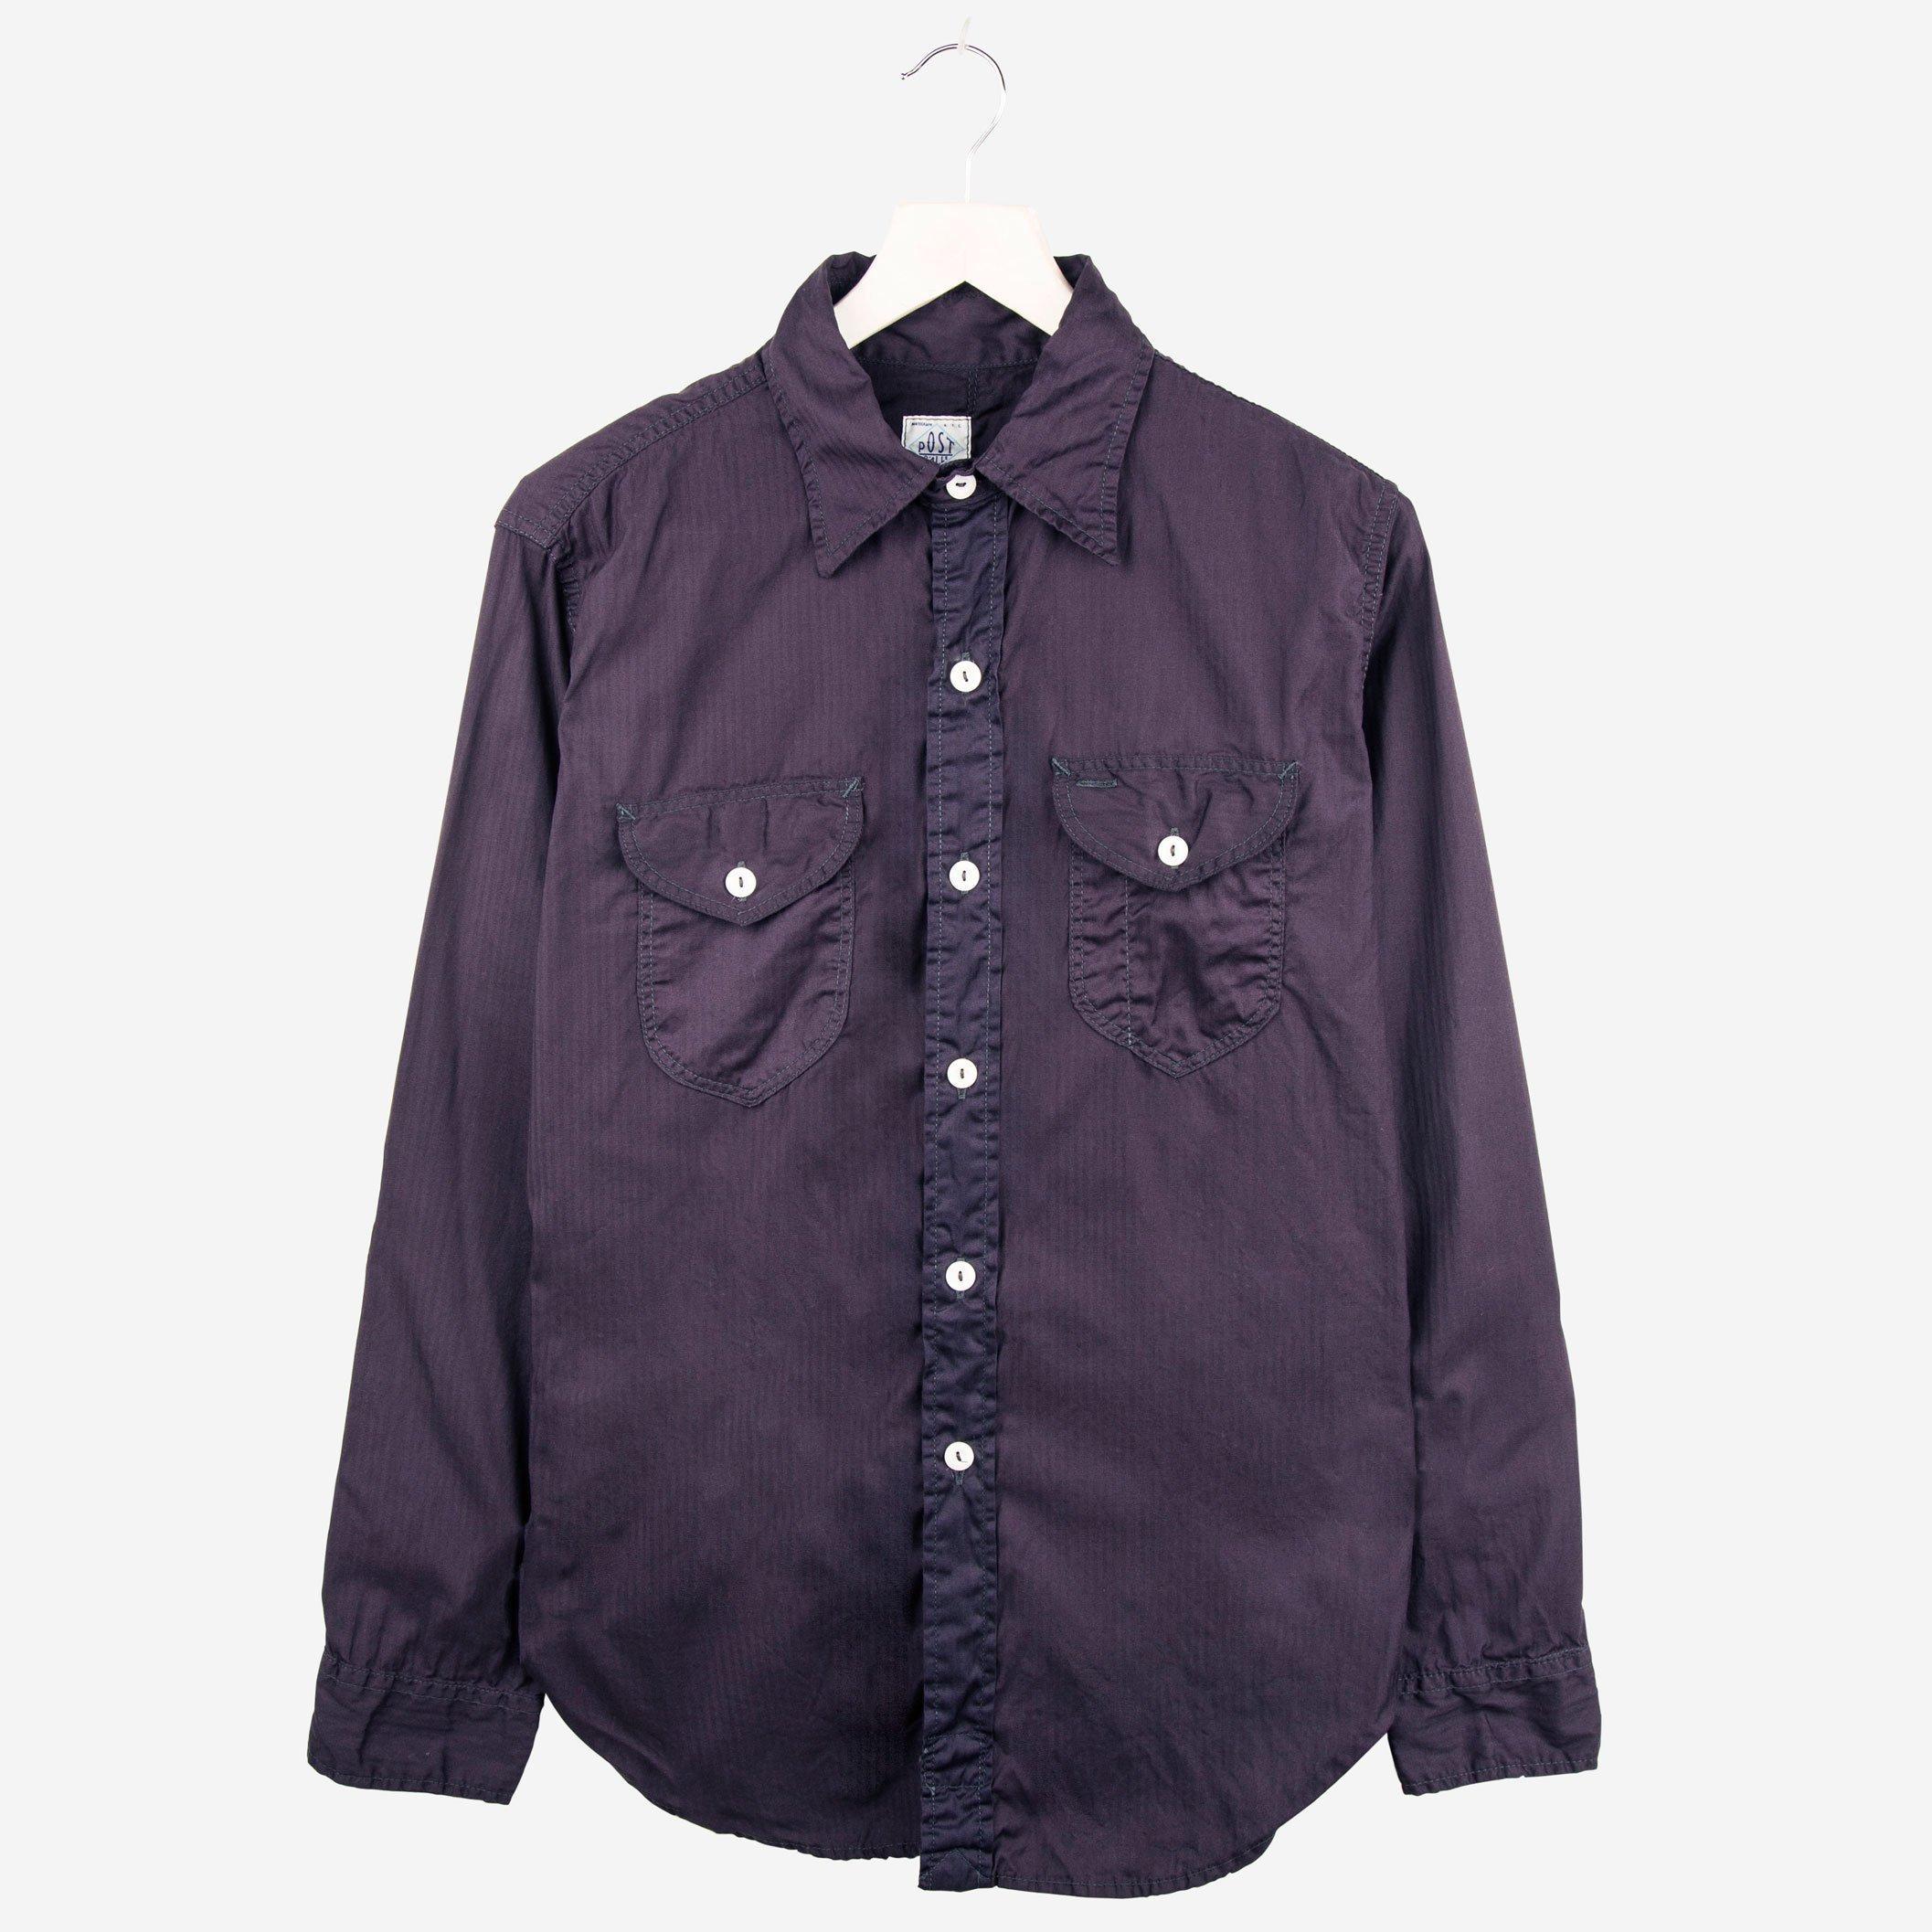 Post Overalls Very Lee Herring bone shirt Navy